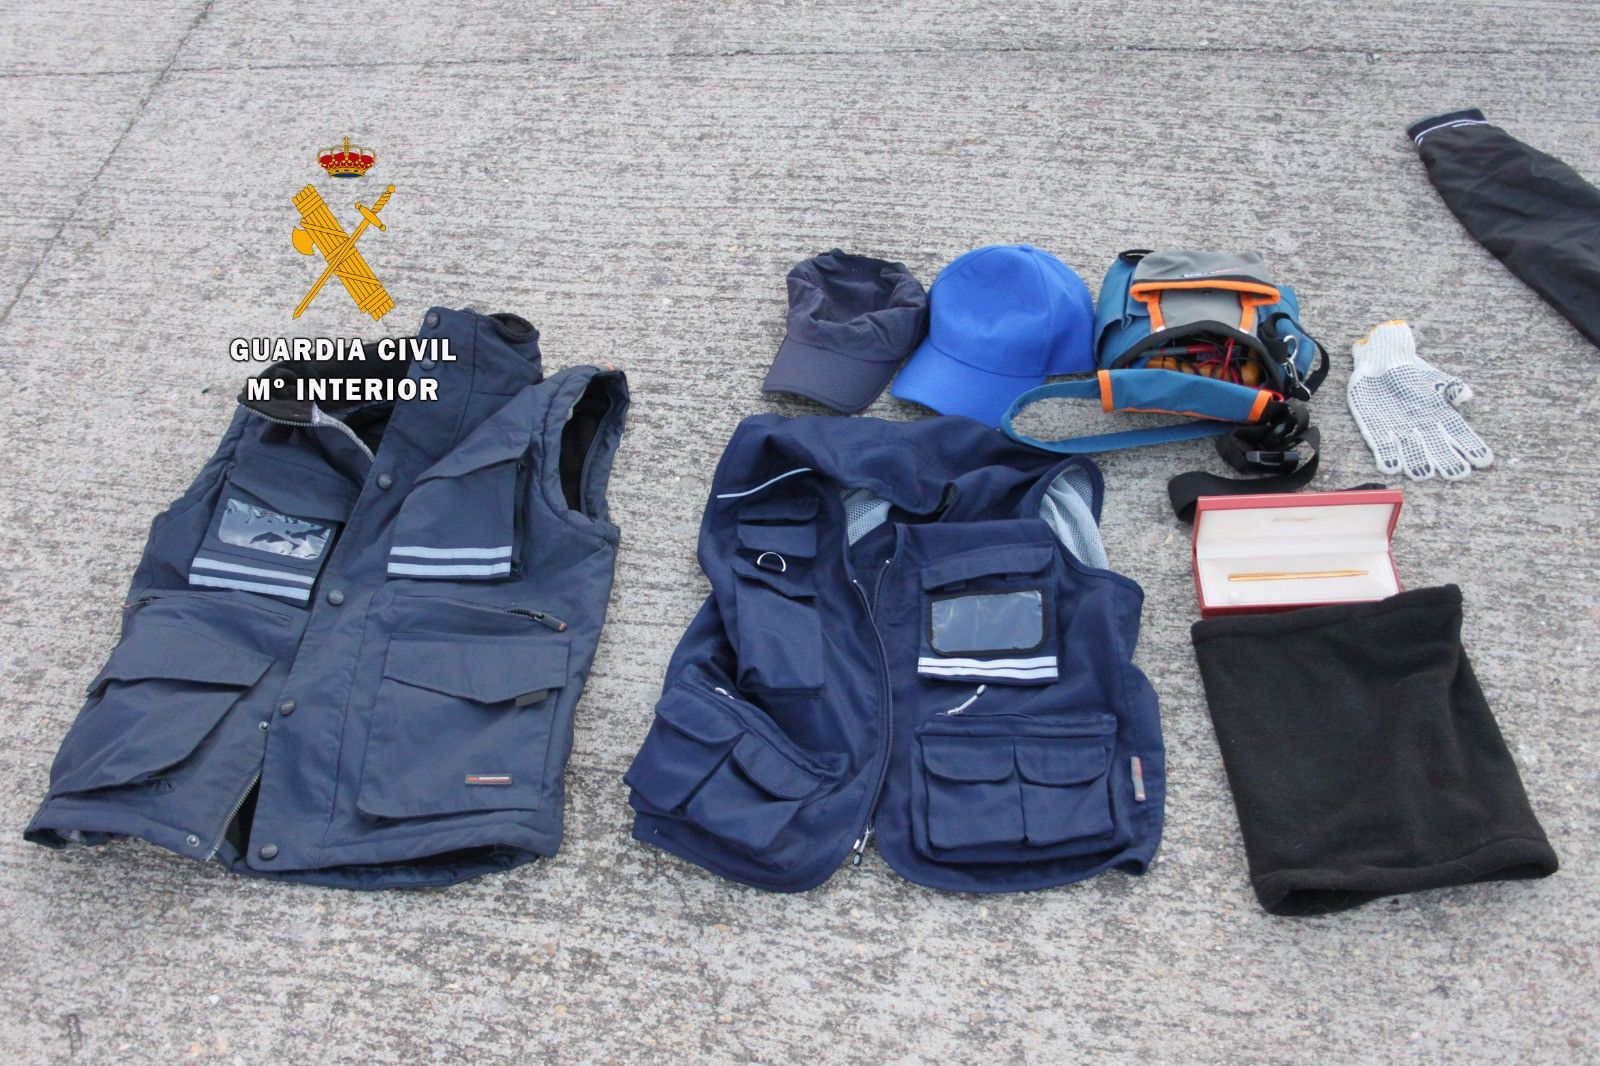 Guardia Civil Cantalapiedra 3